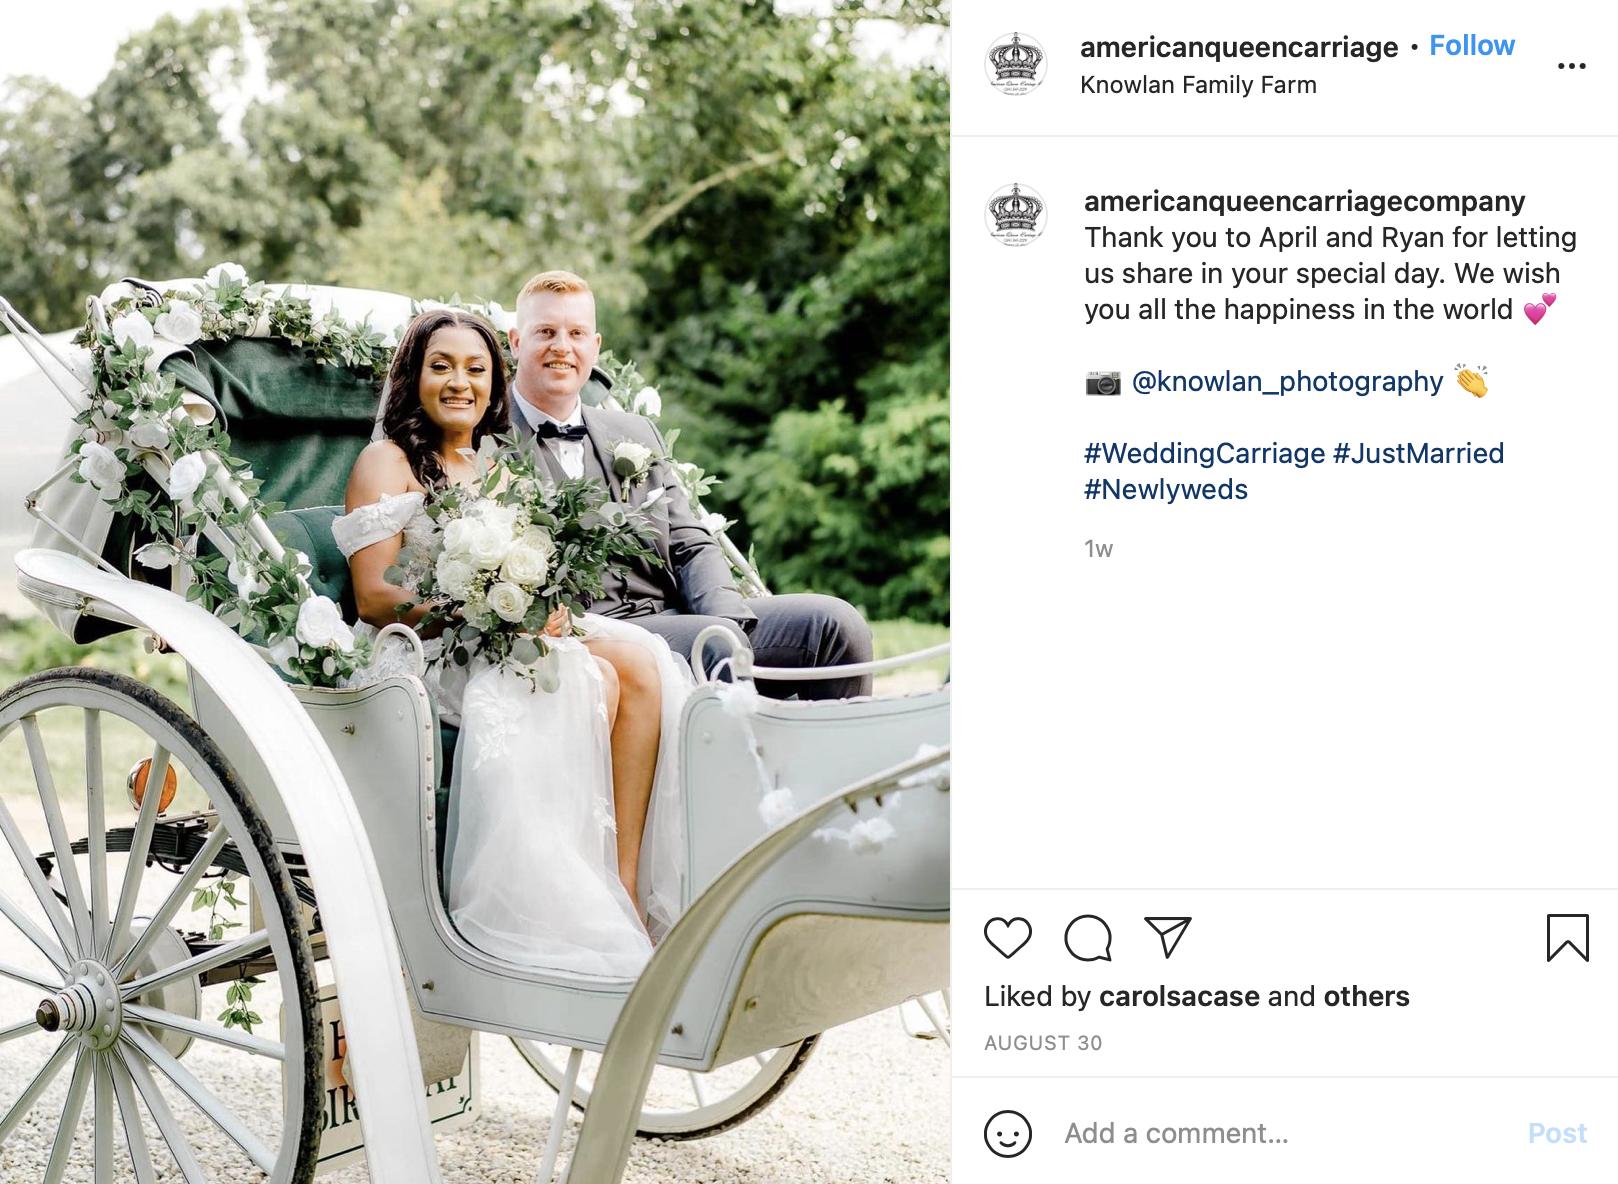 wedding carriage as a getaway car